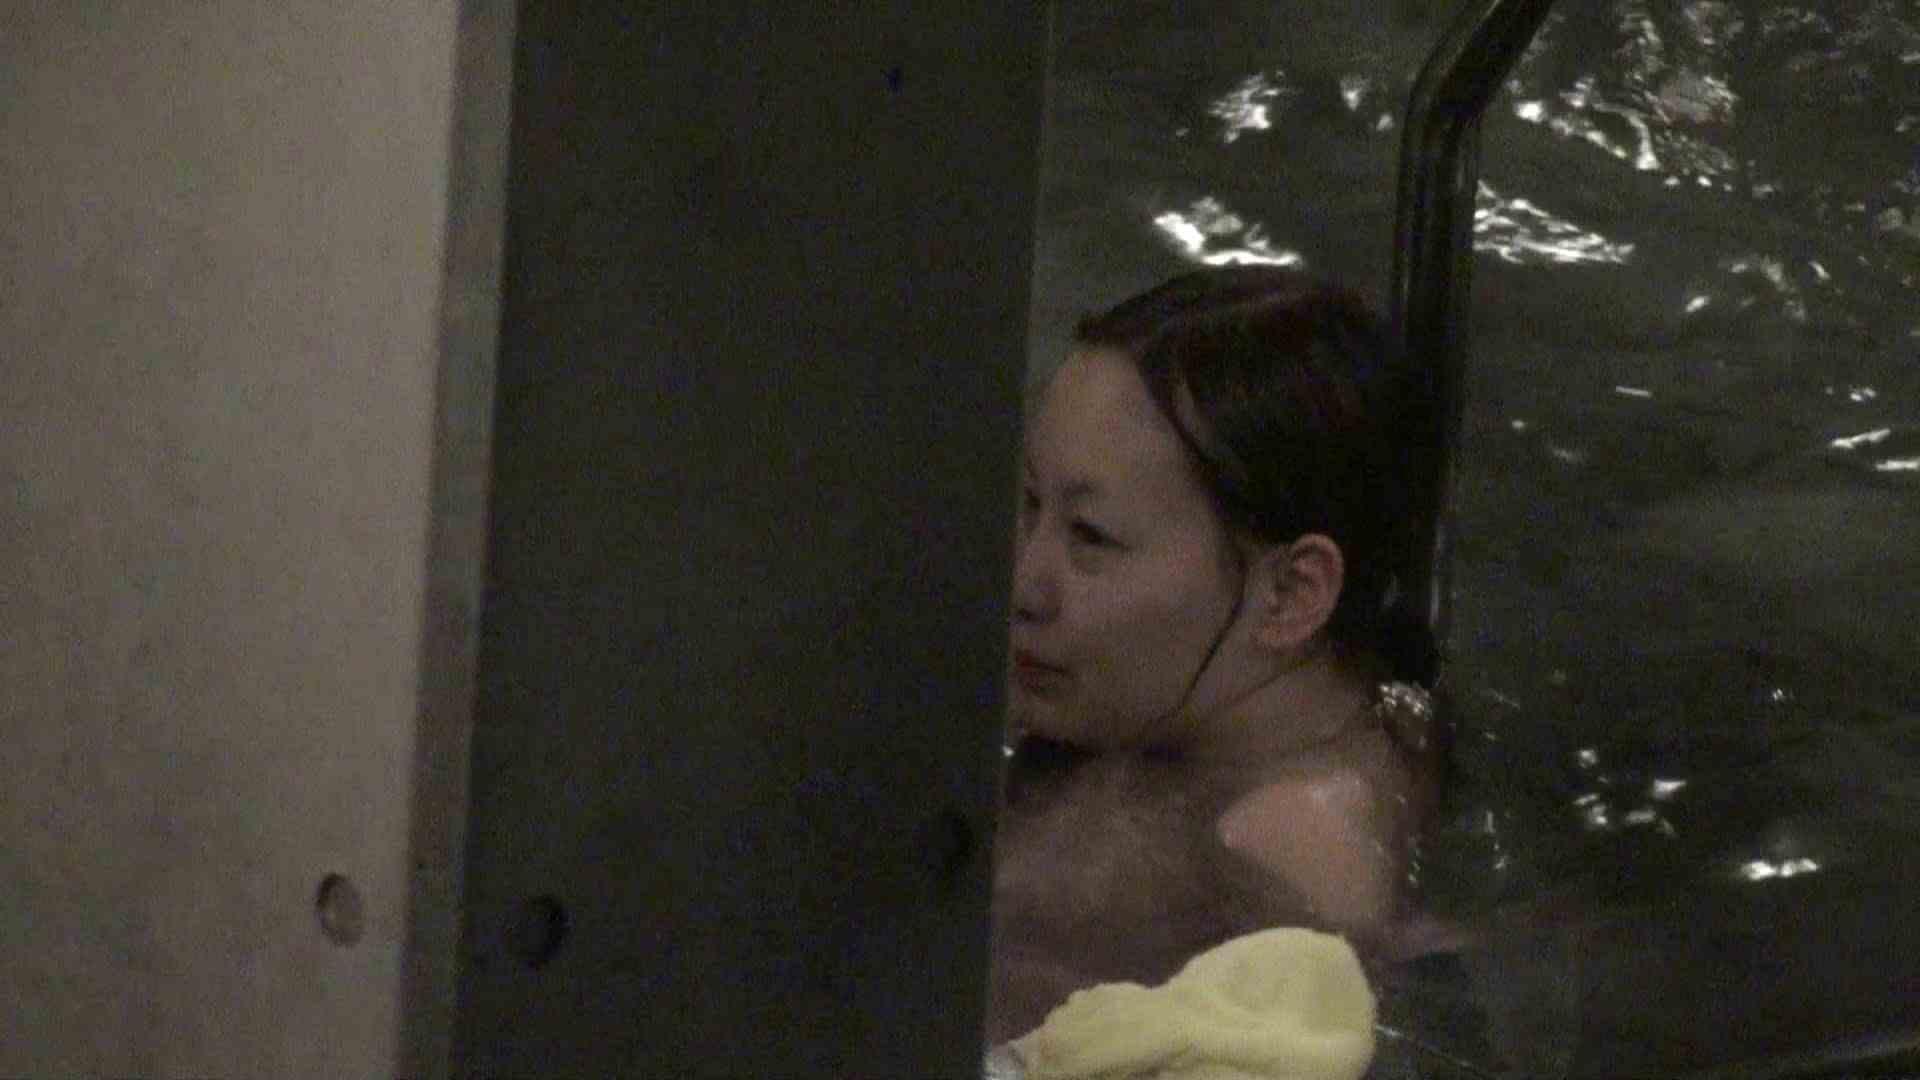 Aquaな露天風呂Vol.438 0 | 0  65連発 35